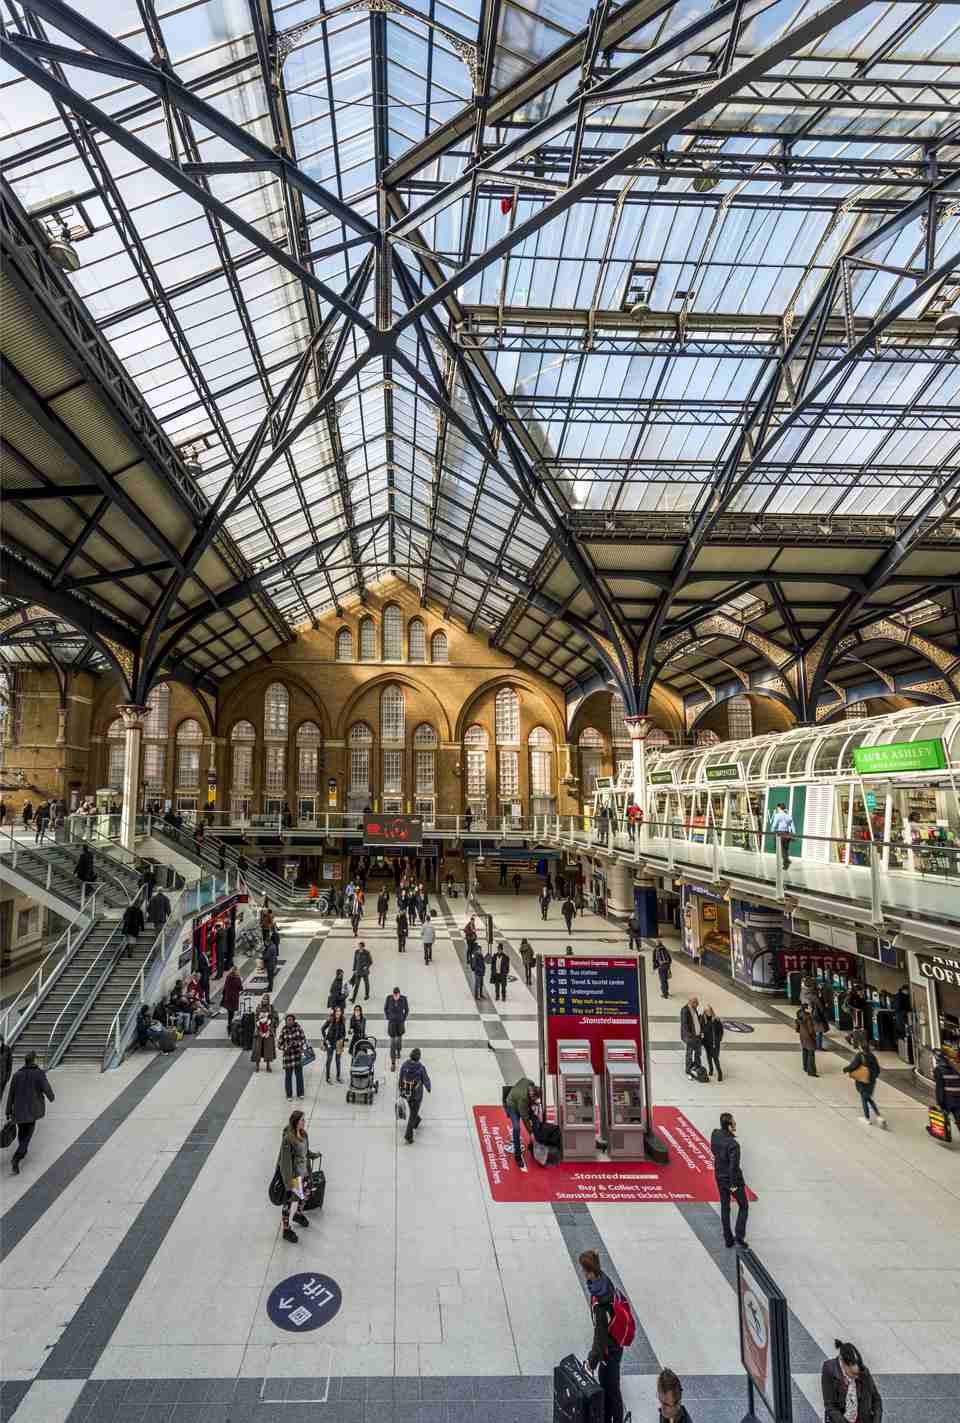 Liverpool Street Station, London, England - UK